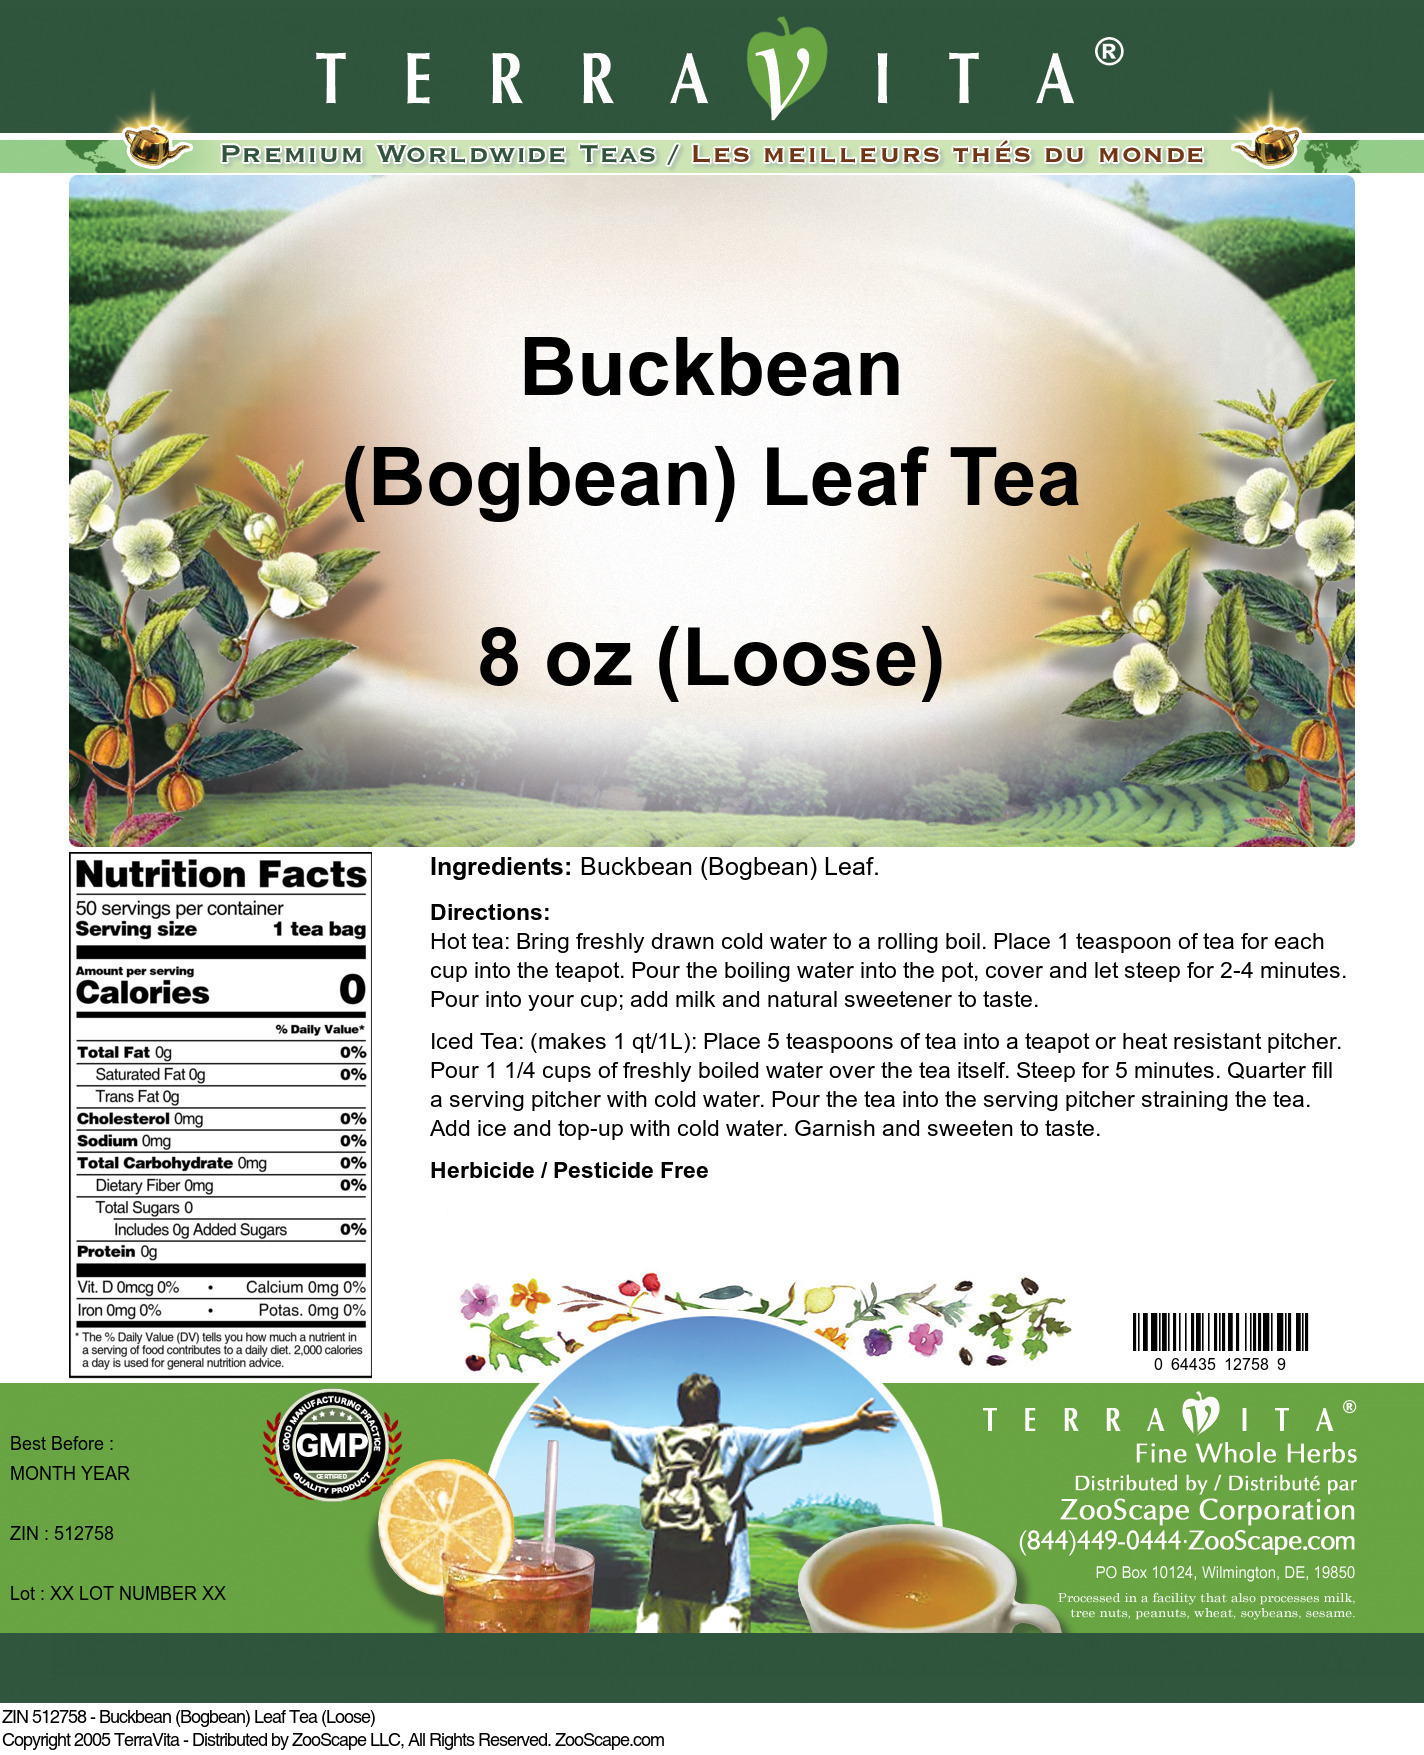 Buckbean (Bogbean) Leaf Tea (Loose)